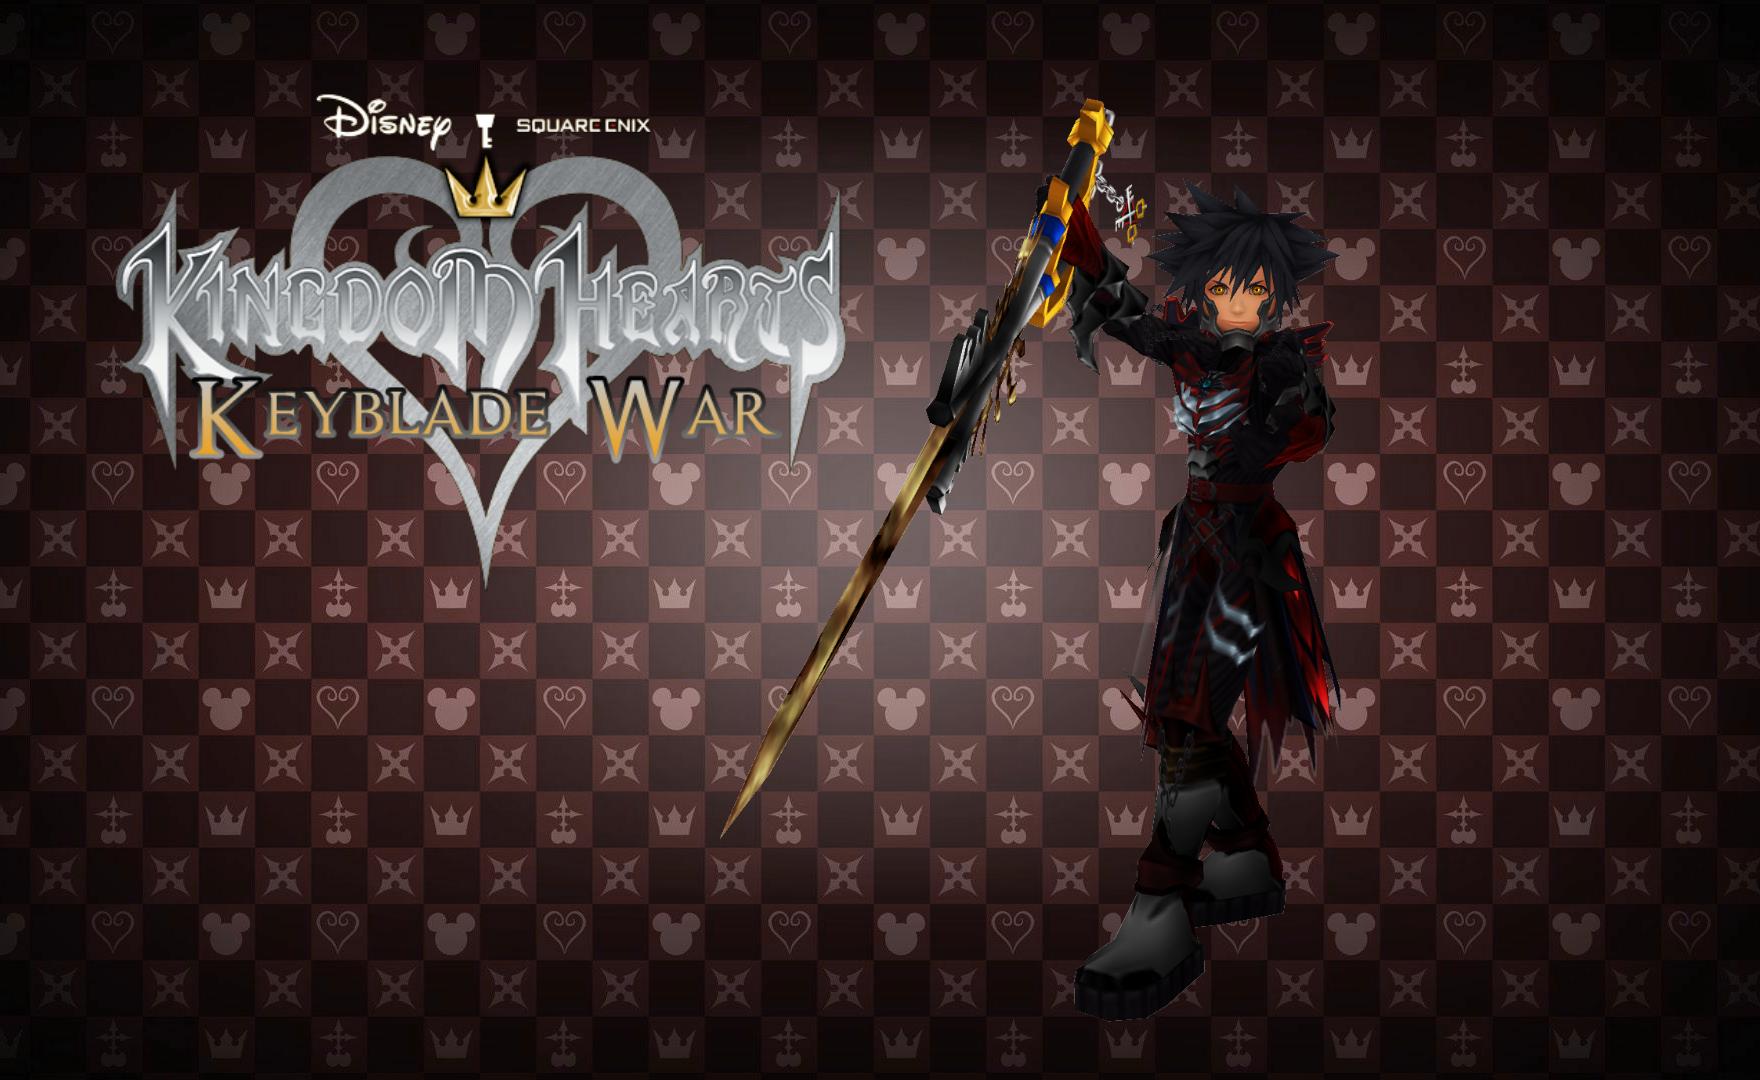 kingdom hearts keyblade war custom wallpaper 08 by